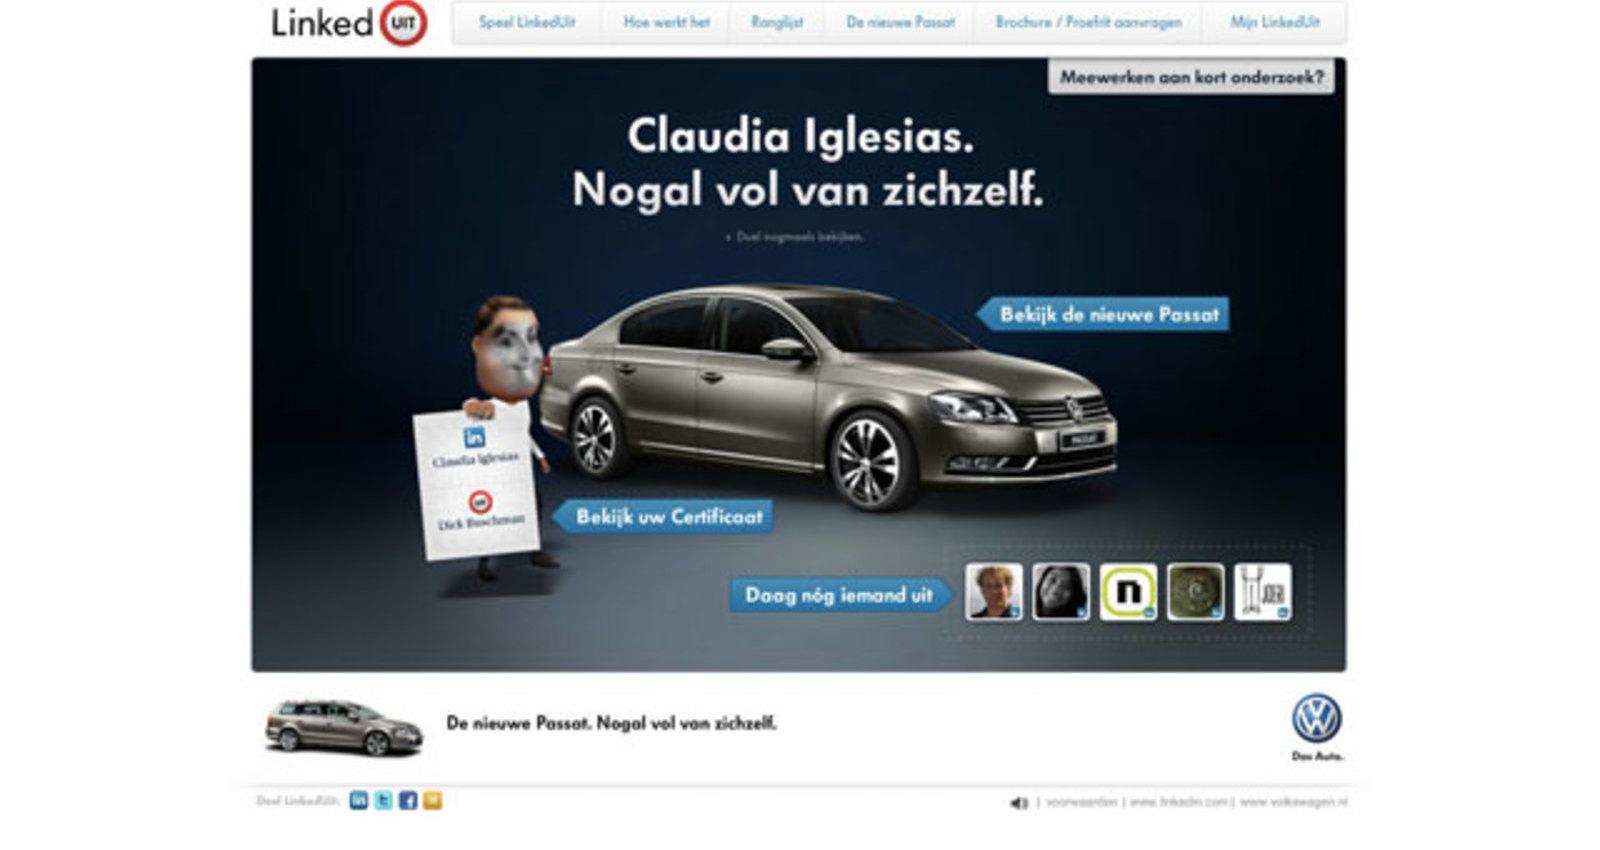 VW LinkedOut